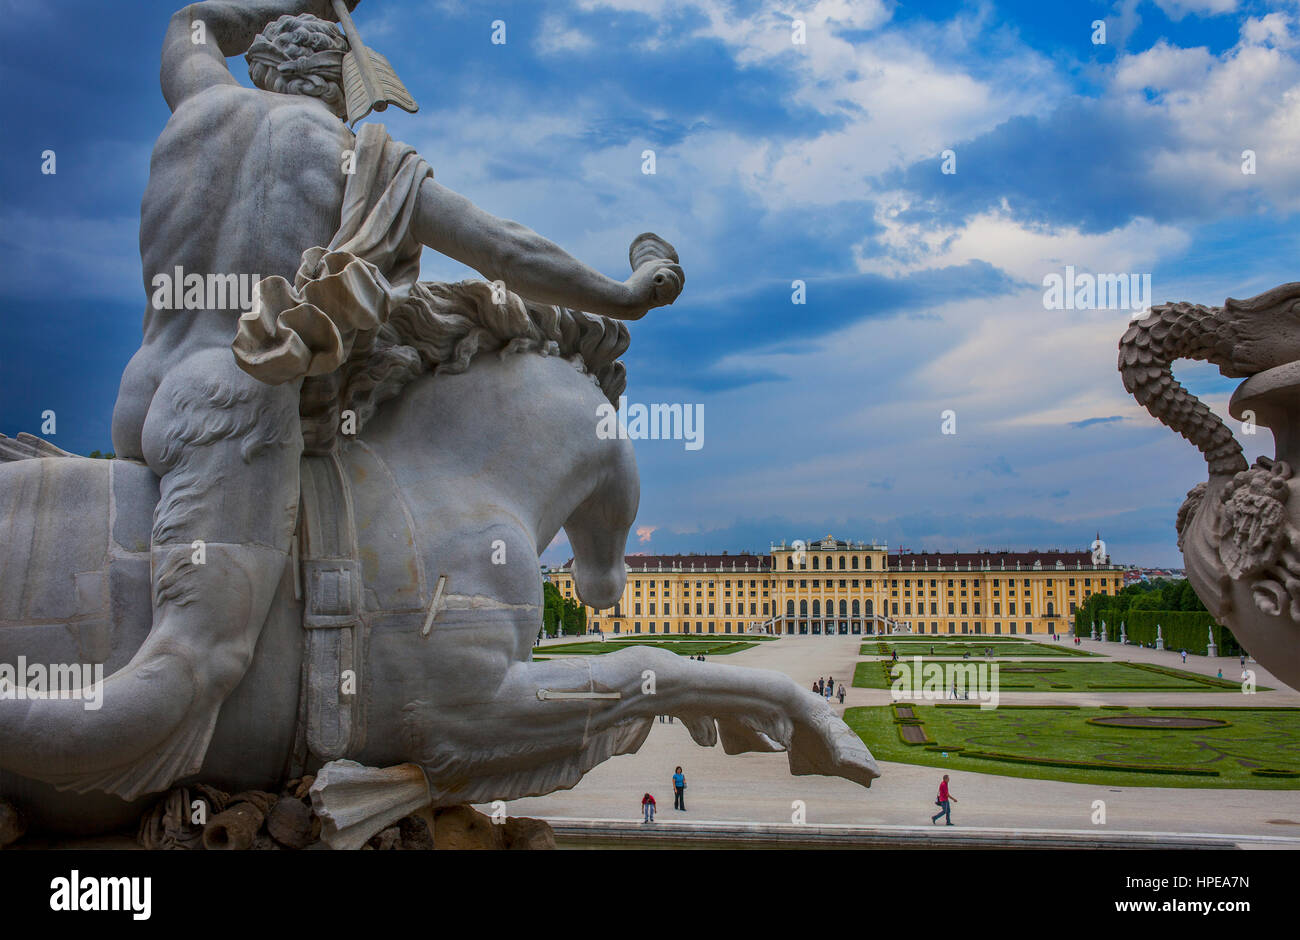 Schönbrunn Palace and gardens from Neptune fountain, Vienna, Austria, Europe - Stock Image